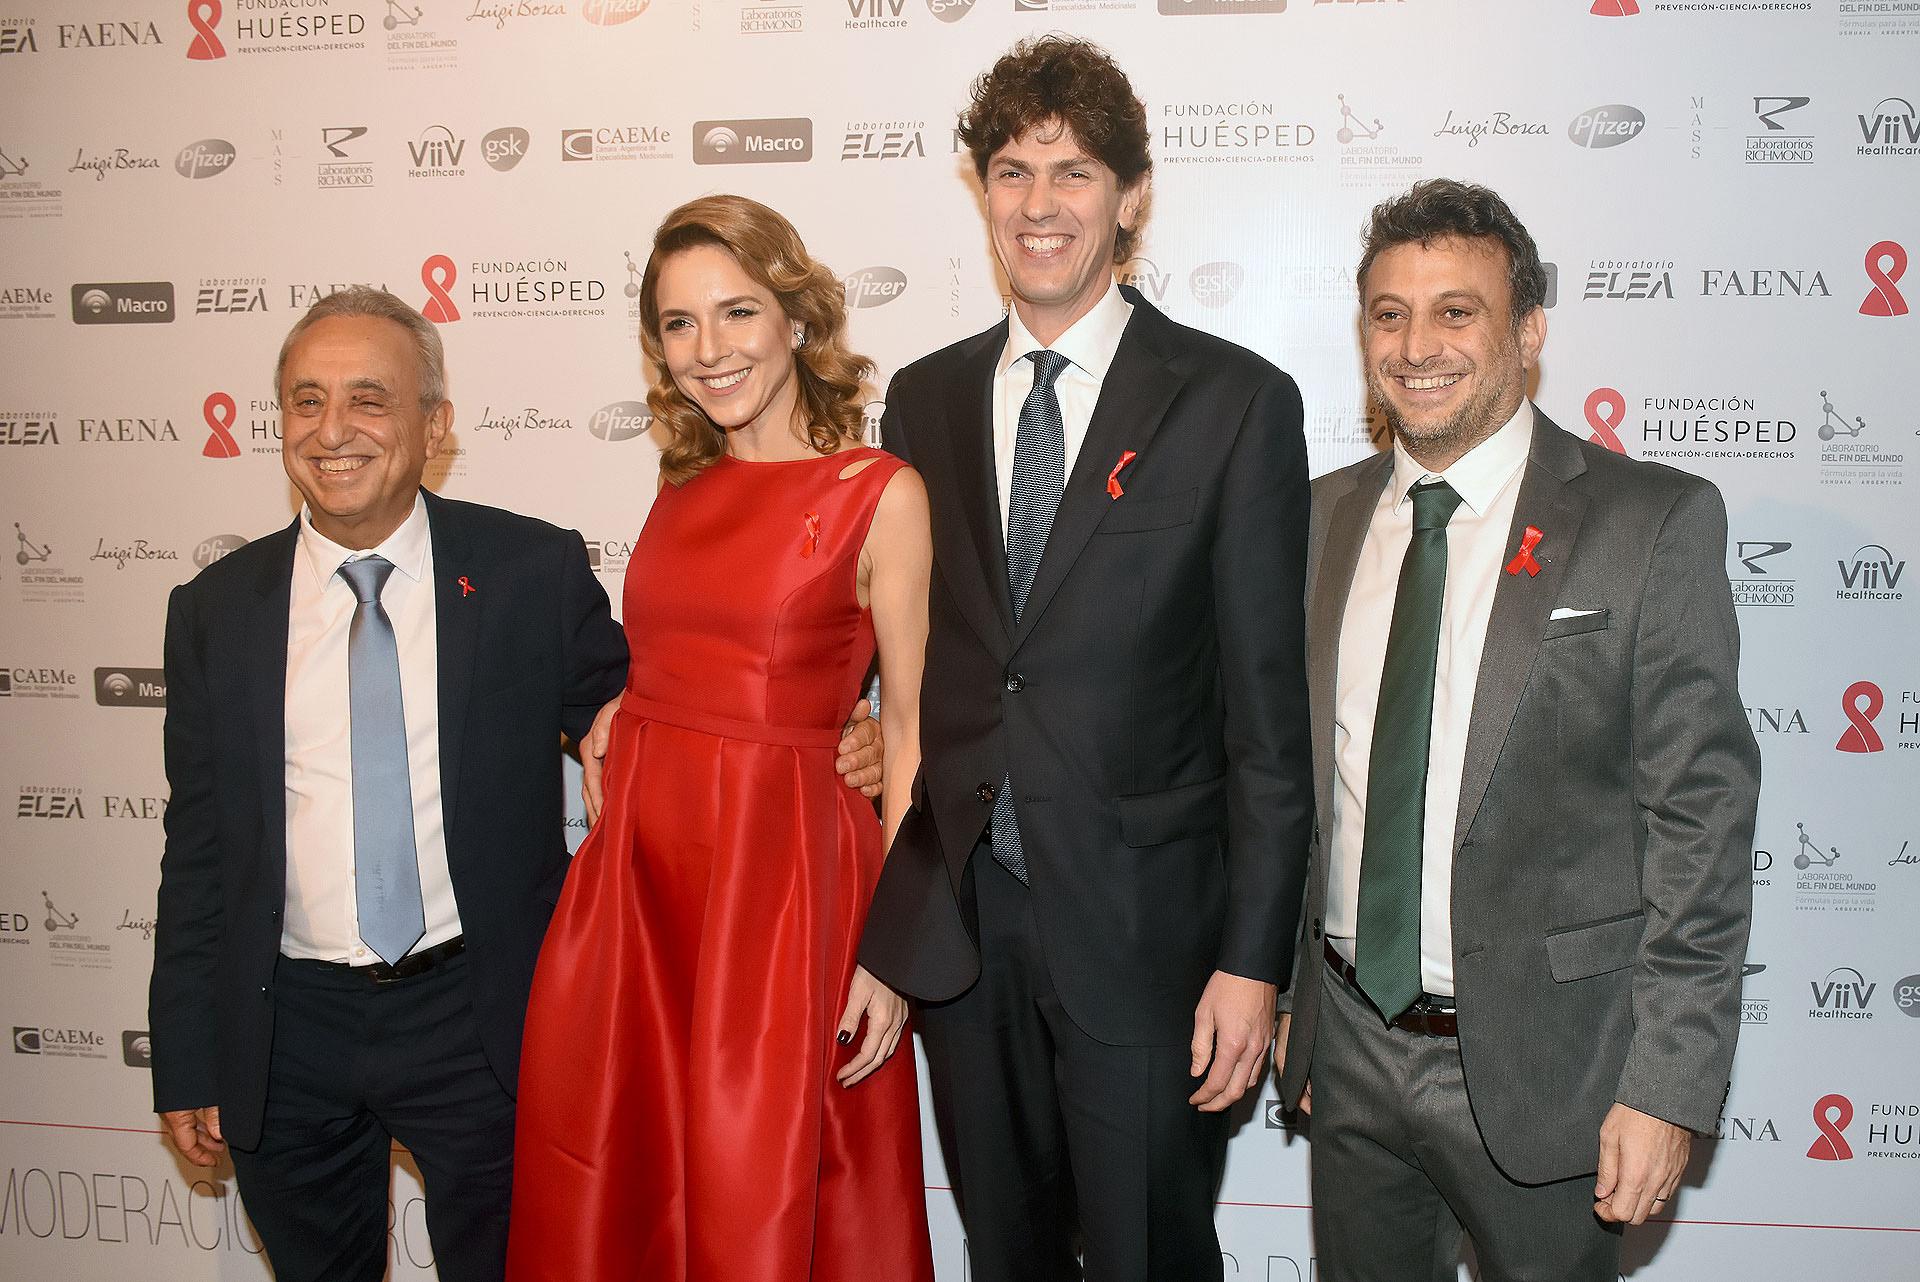 Pedro Cahn, Carla Peterson, Martín Lousteau y Leandro Cahn